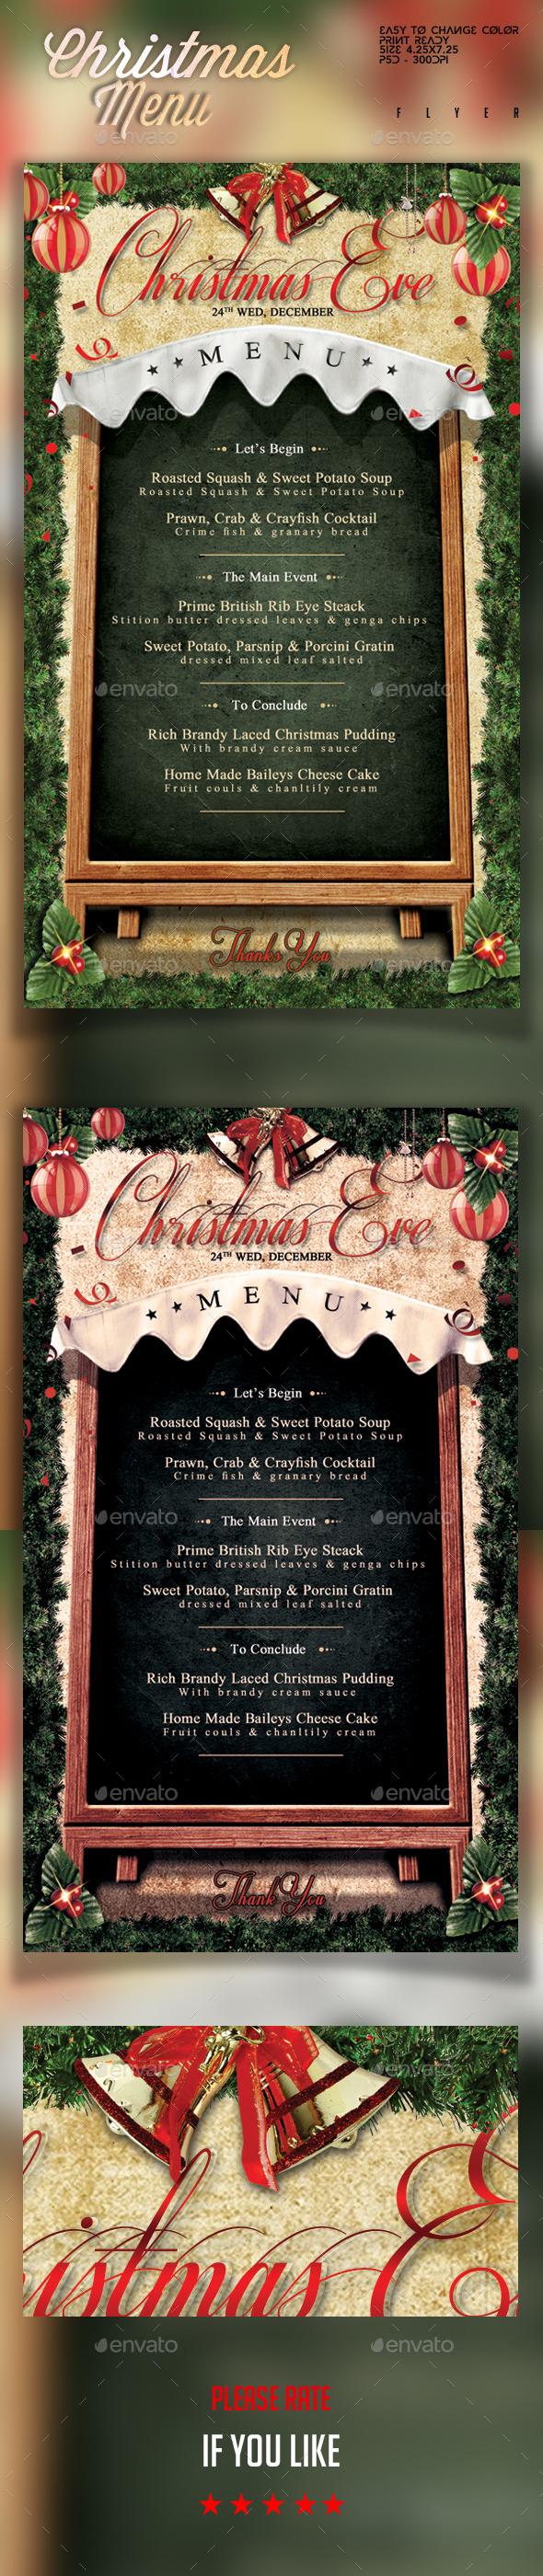 Christmas Menu Flyer Template - Holidays Events